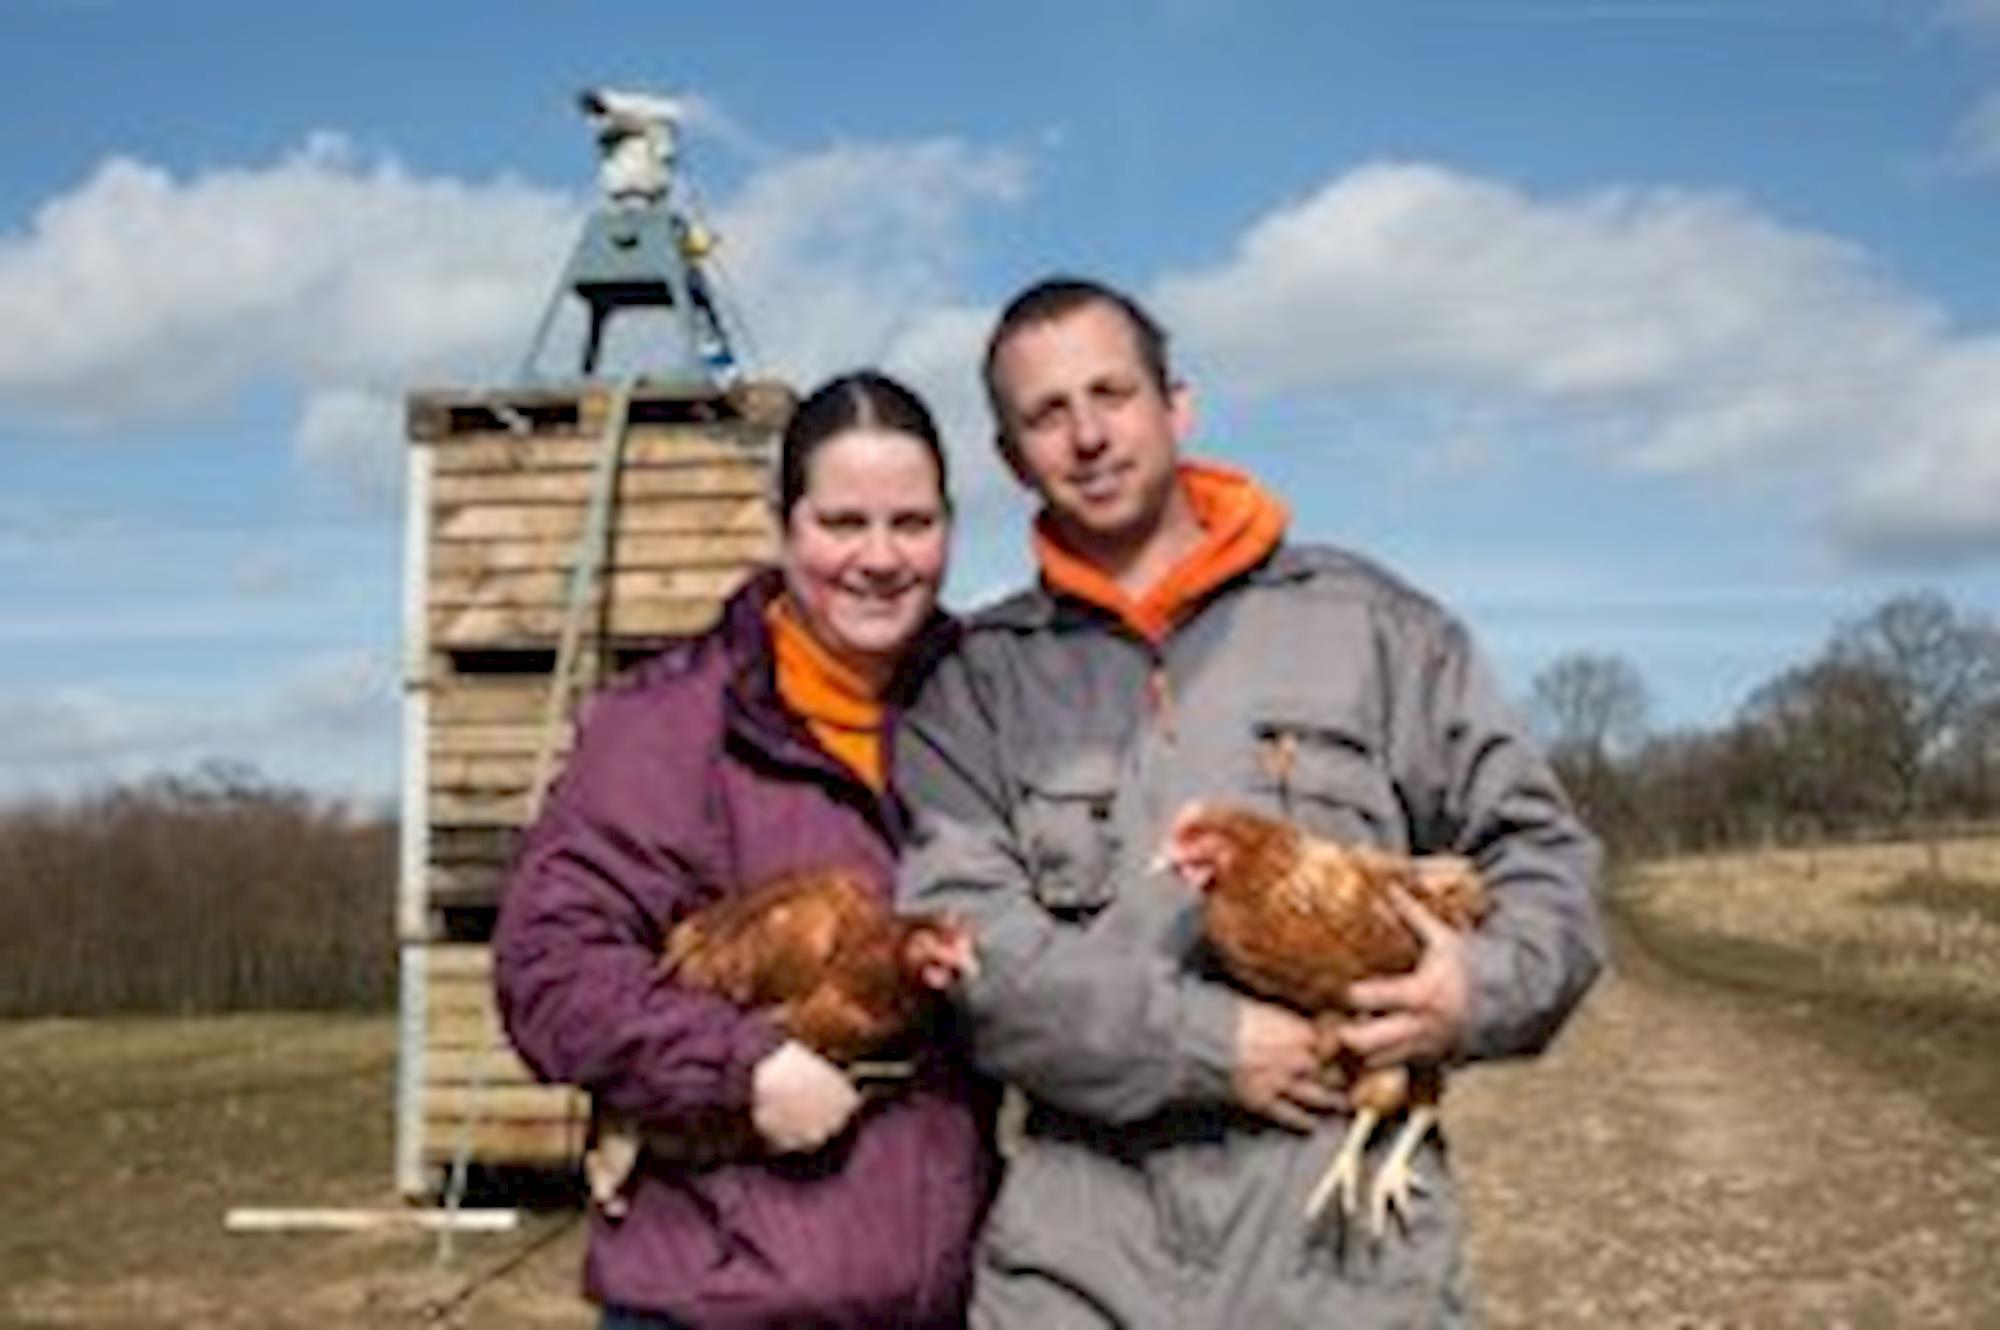 2017, releases empresas, fotos atualizadas , Poultry World/ Chris McCullough